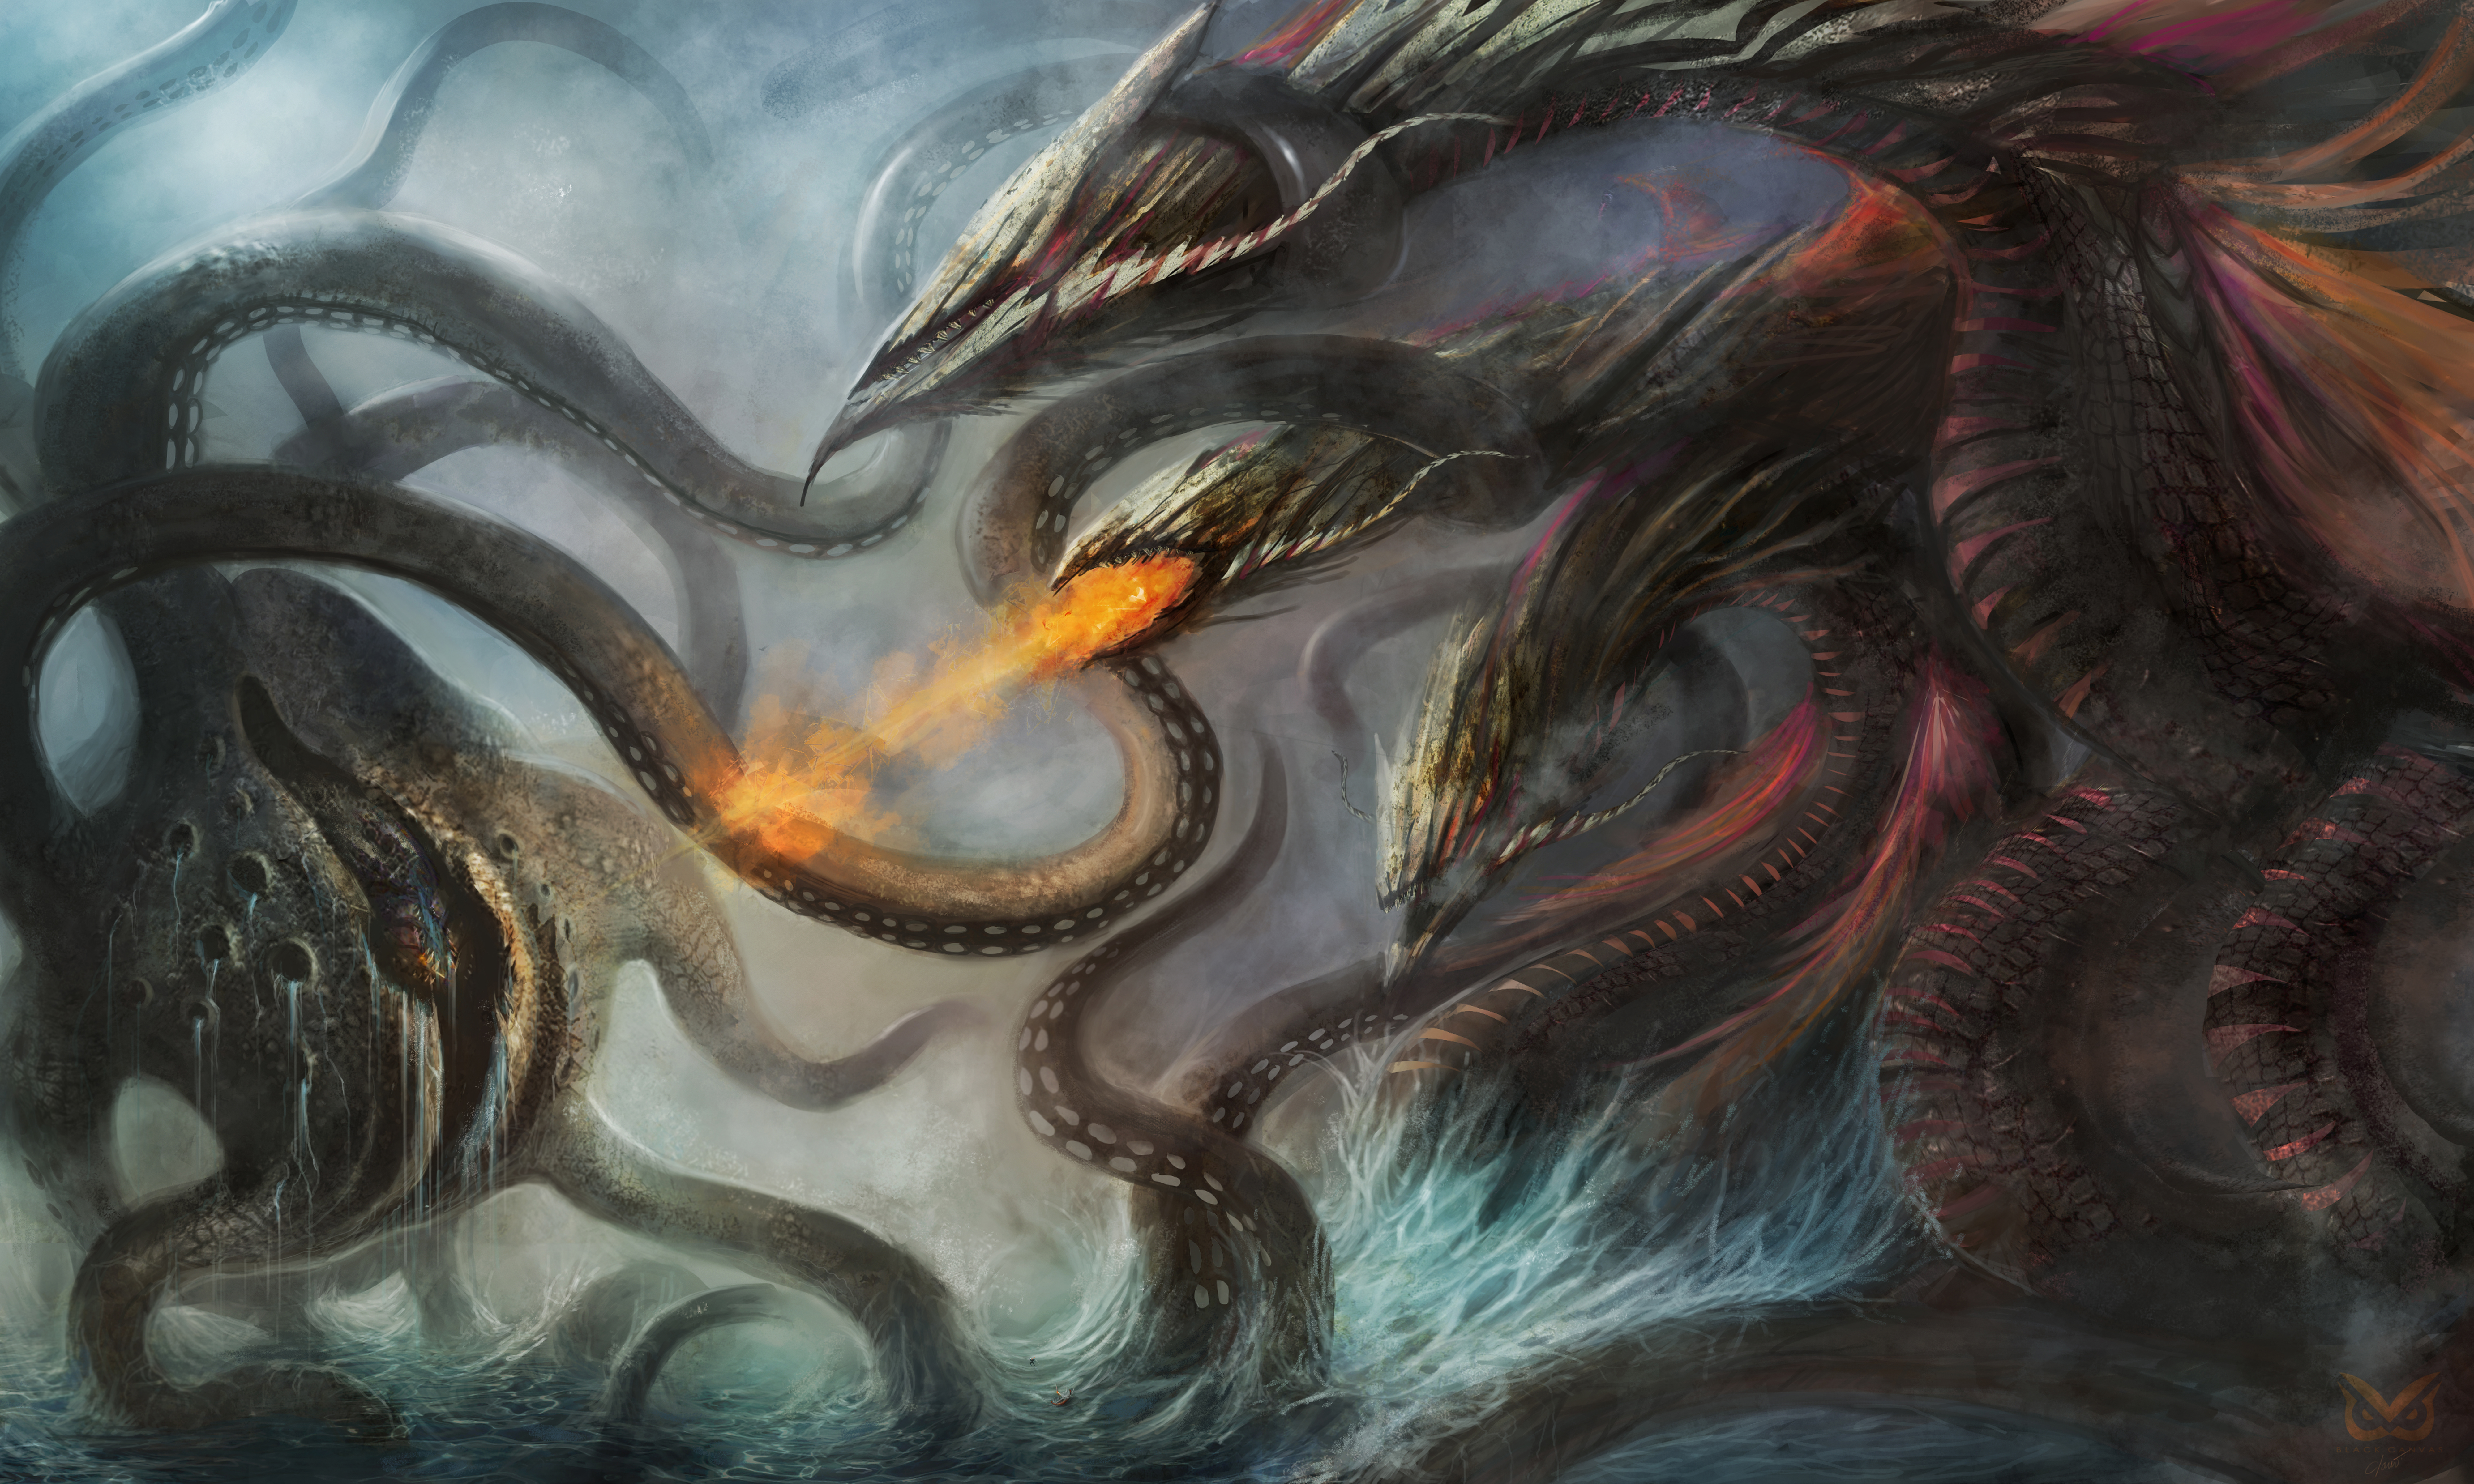 Wrath of the Fisherman by Darkcloud013